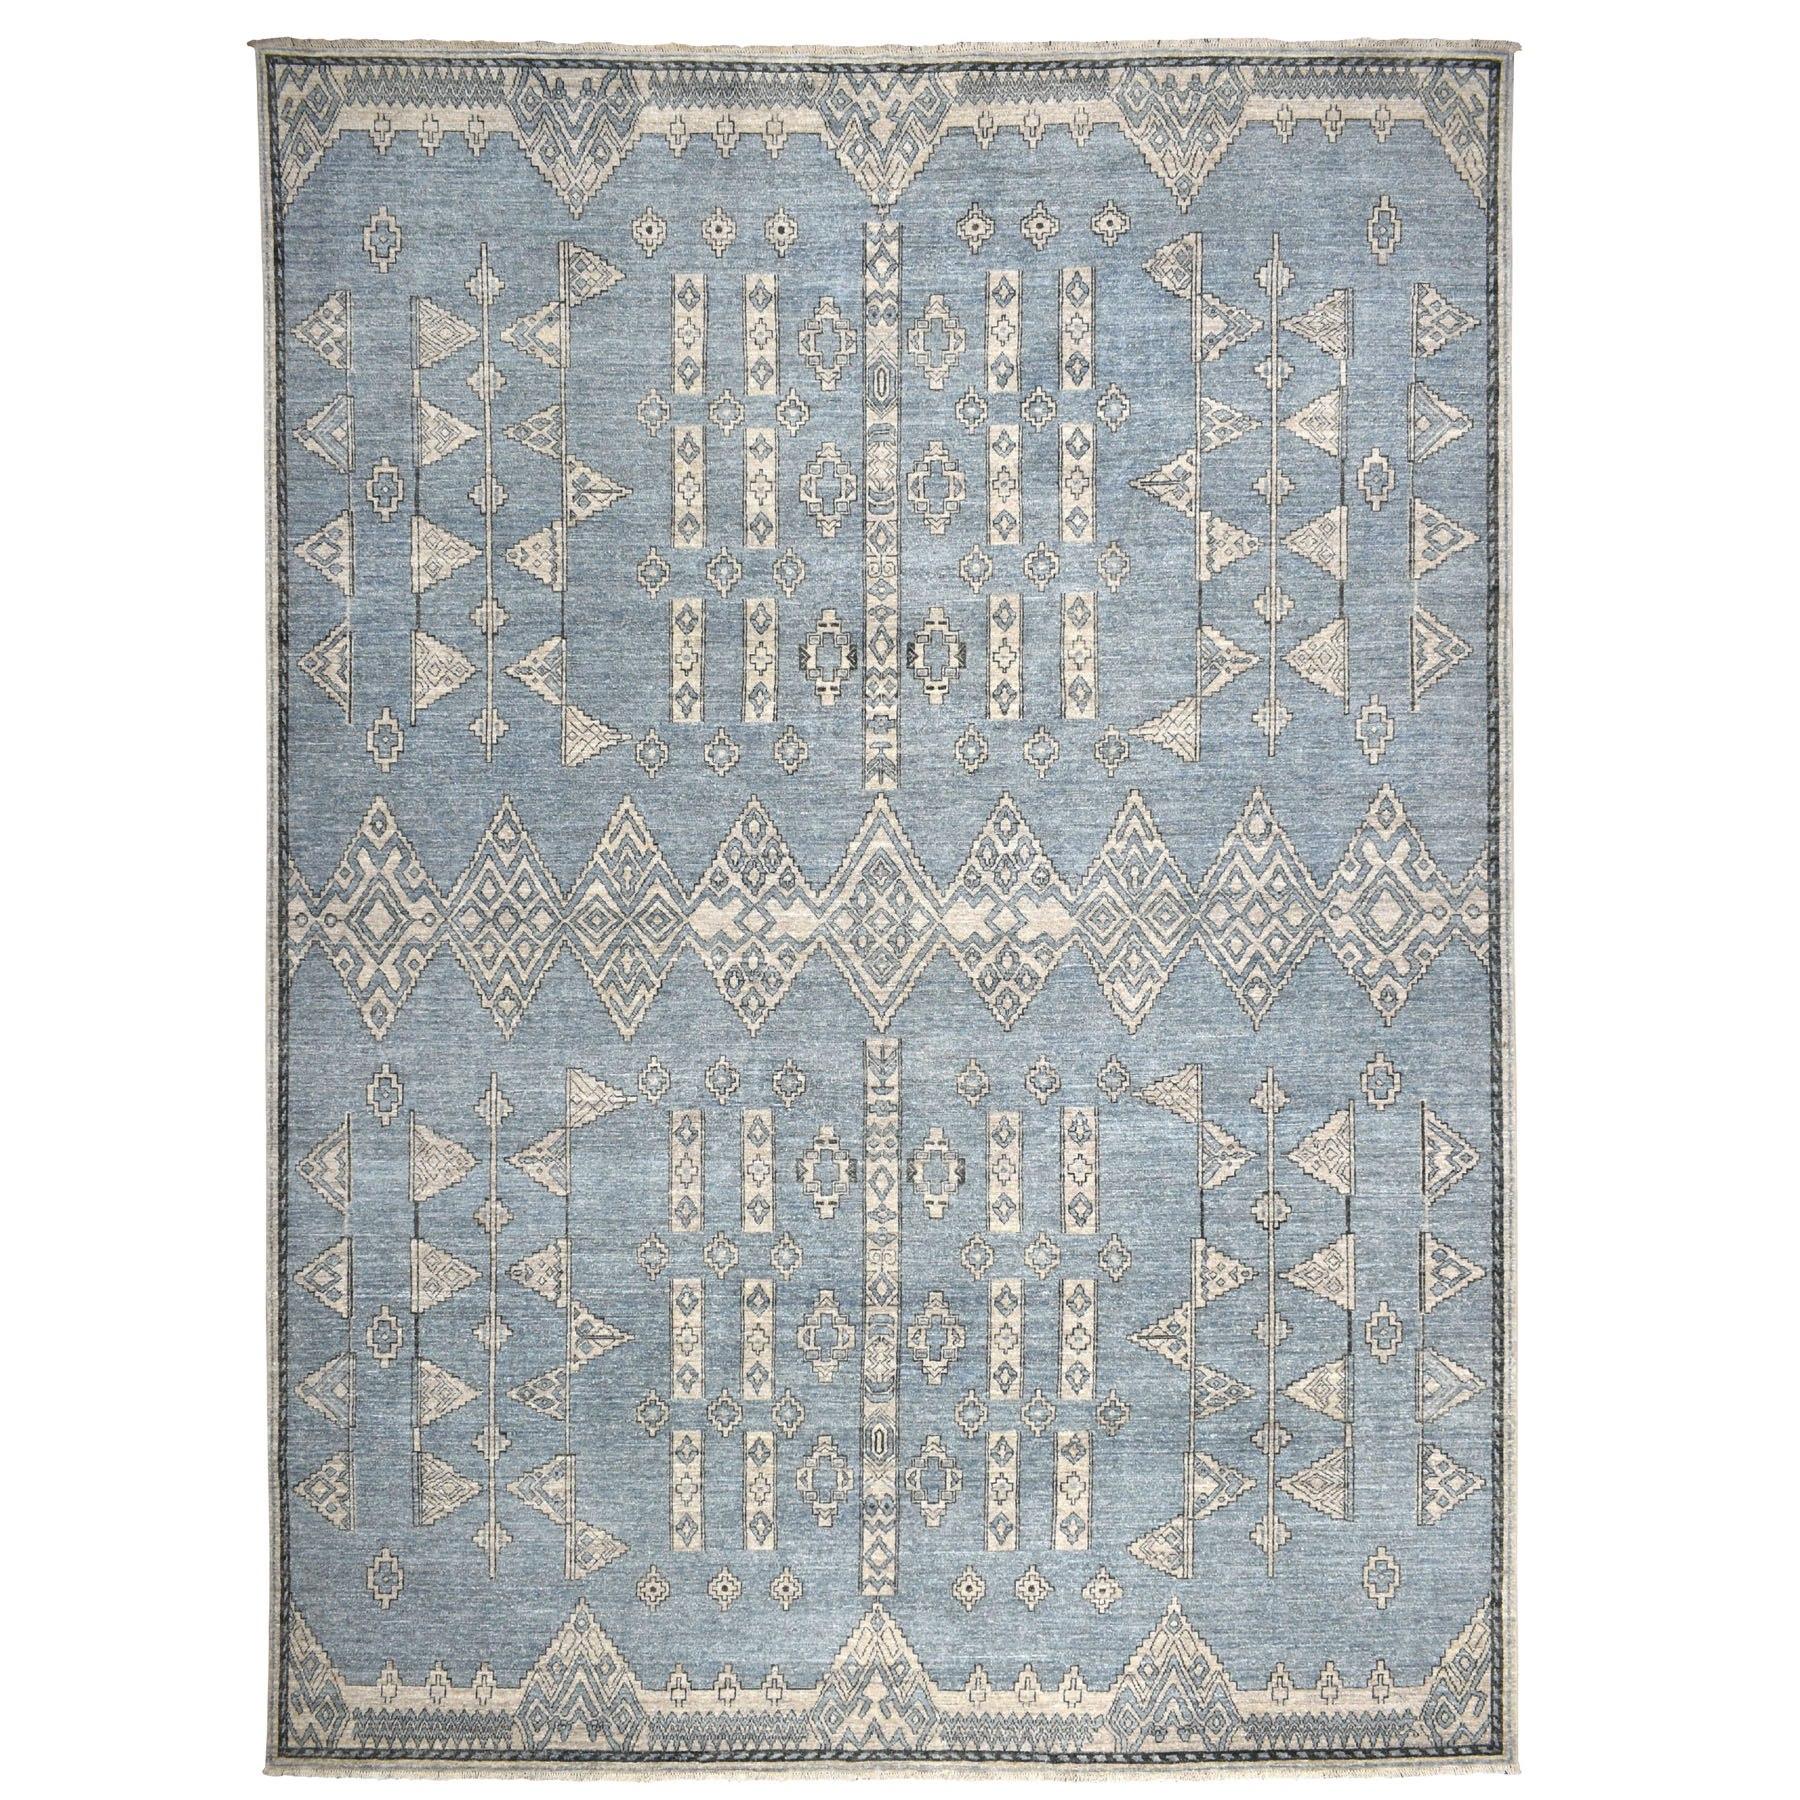 "10'1""X13'10"" Blue Peshawar With Berber Motifs Design Pure Wool Hand-Knotted Oriental Rug moaeb96b"